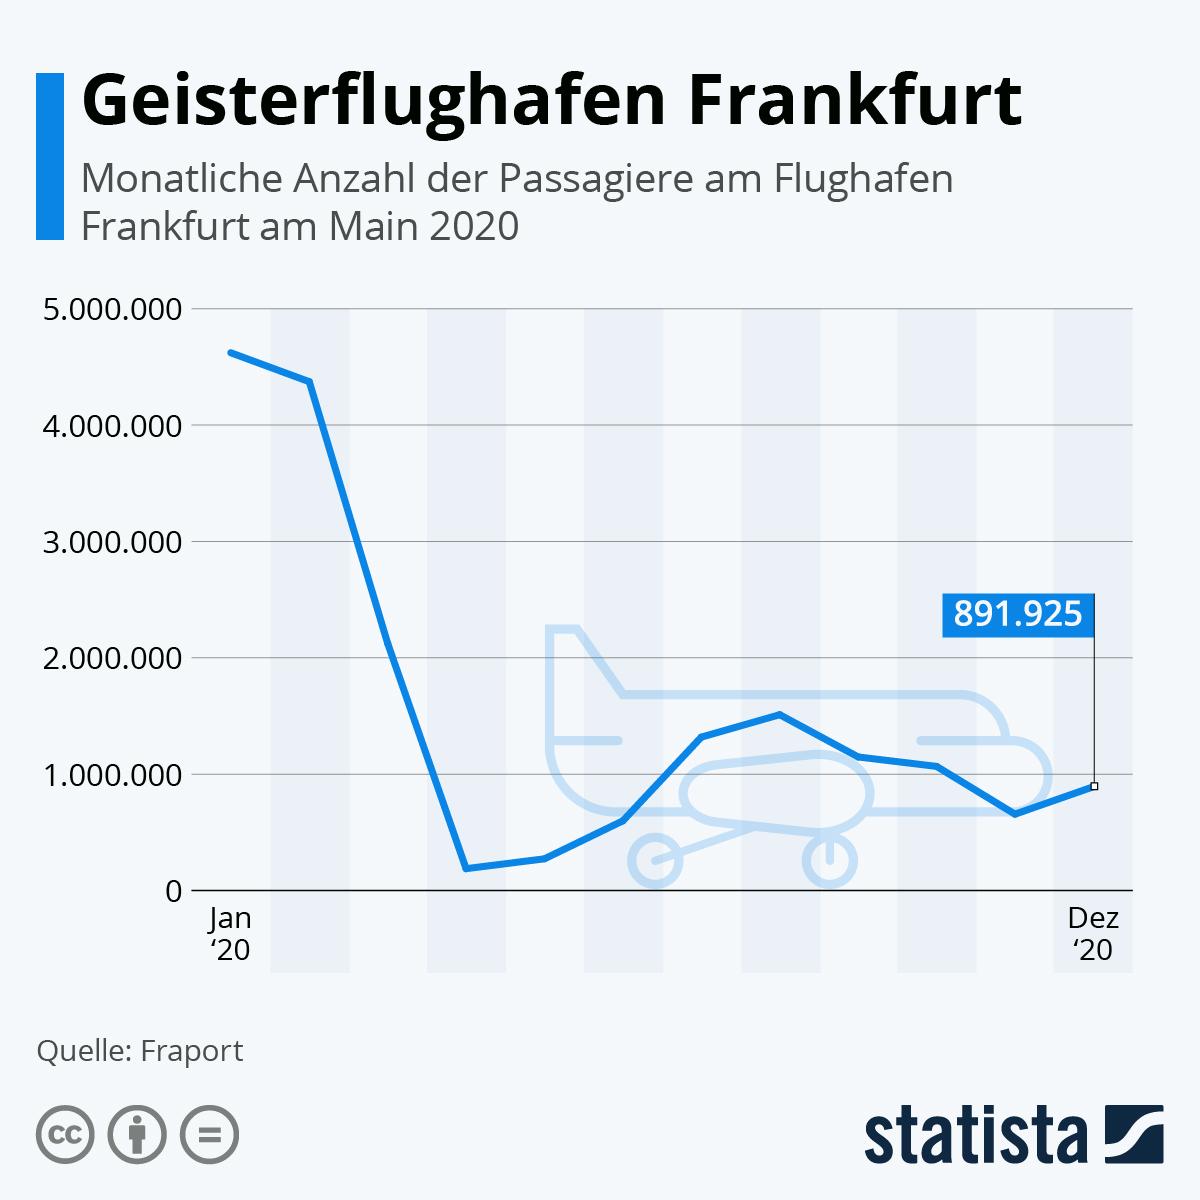 Infografik: Geisterflughafen Frankfurt | Statista